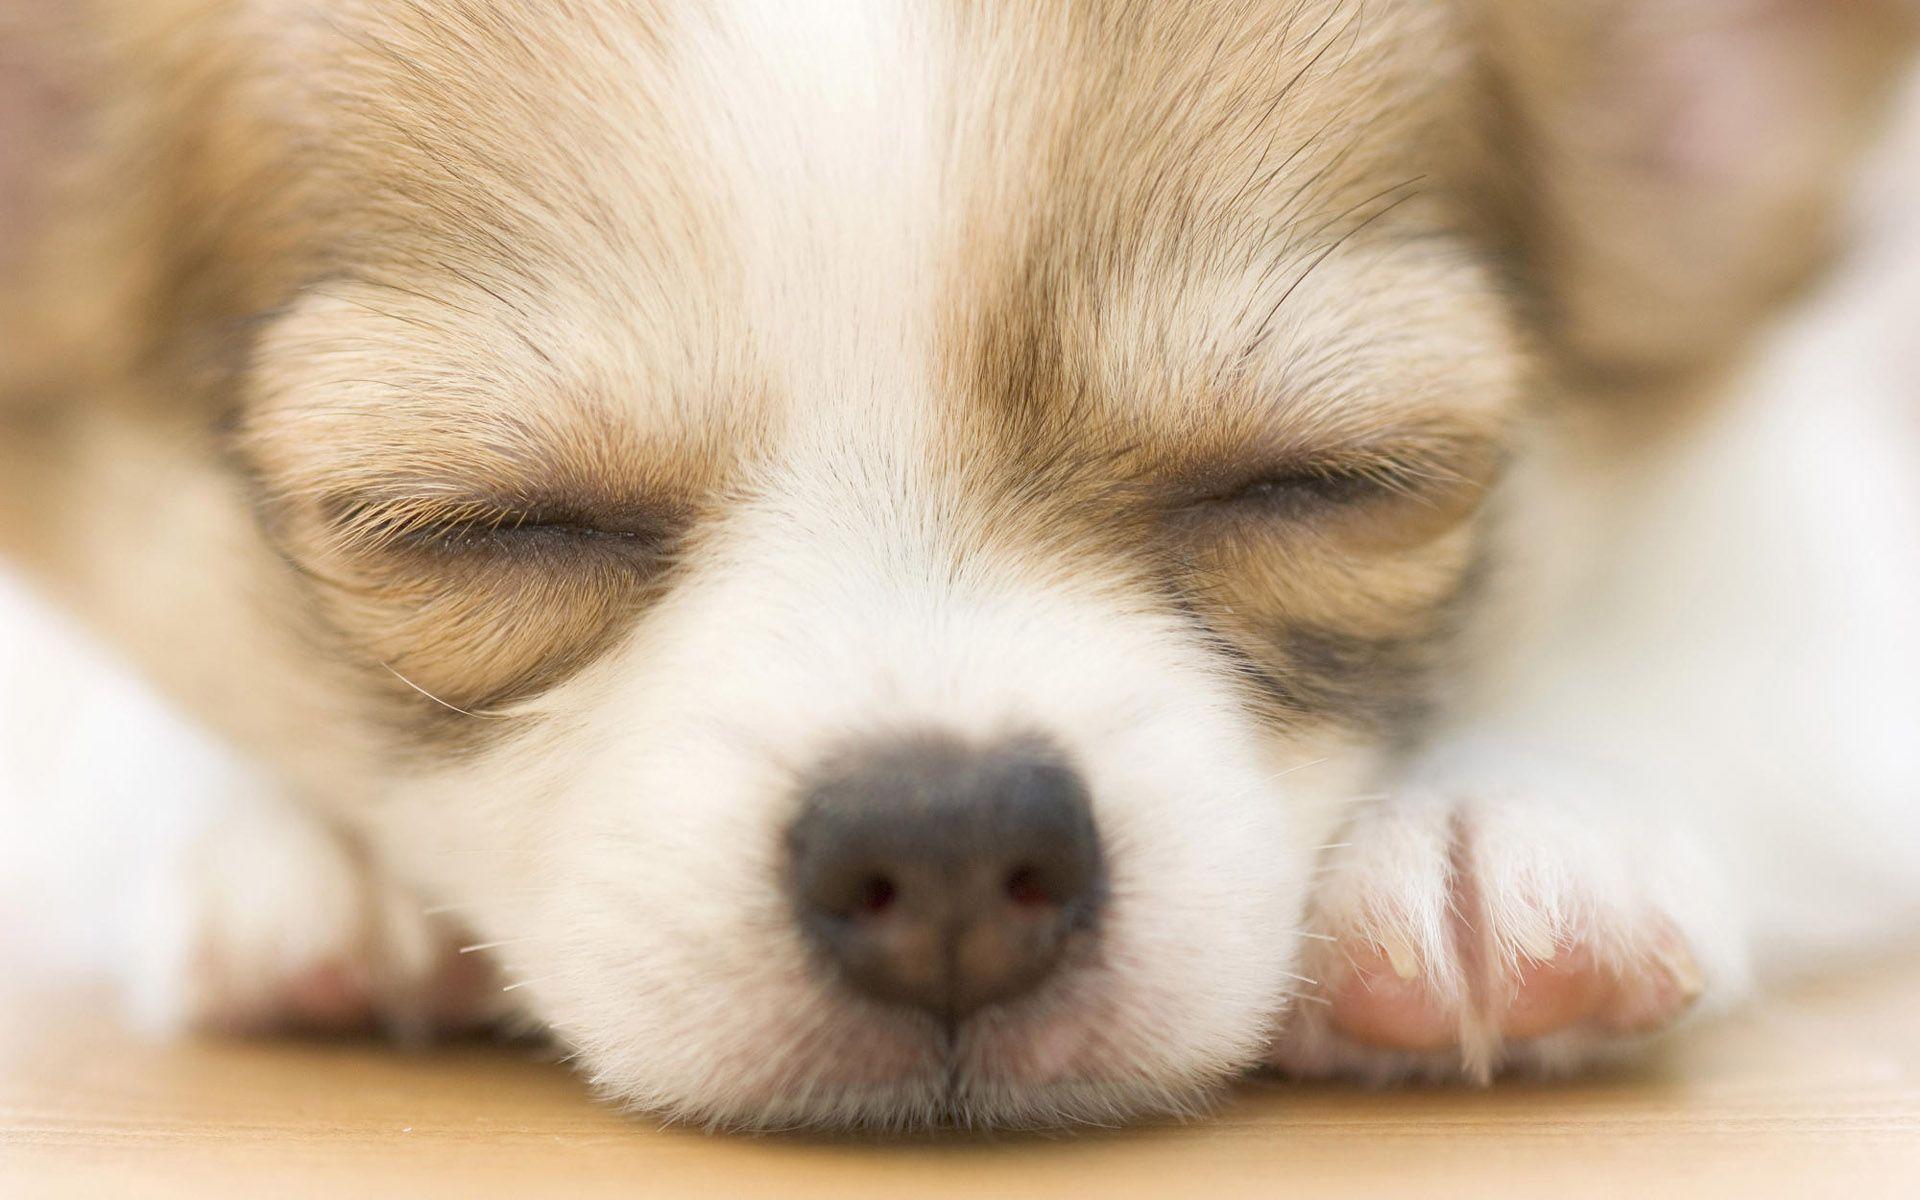 Wallpaper Homescreen Lockscreen Cute Dog Follow Me Find More Cute Dog Hd Wallpaper Everyday Cute Husky Puppies Cute Dog Wallpaper Puppy Wallpaper